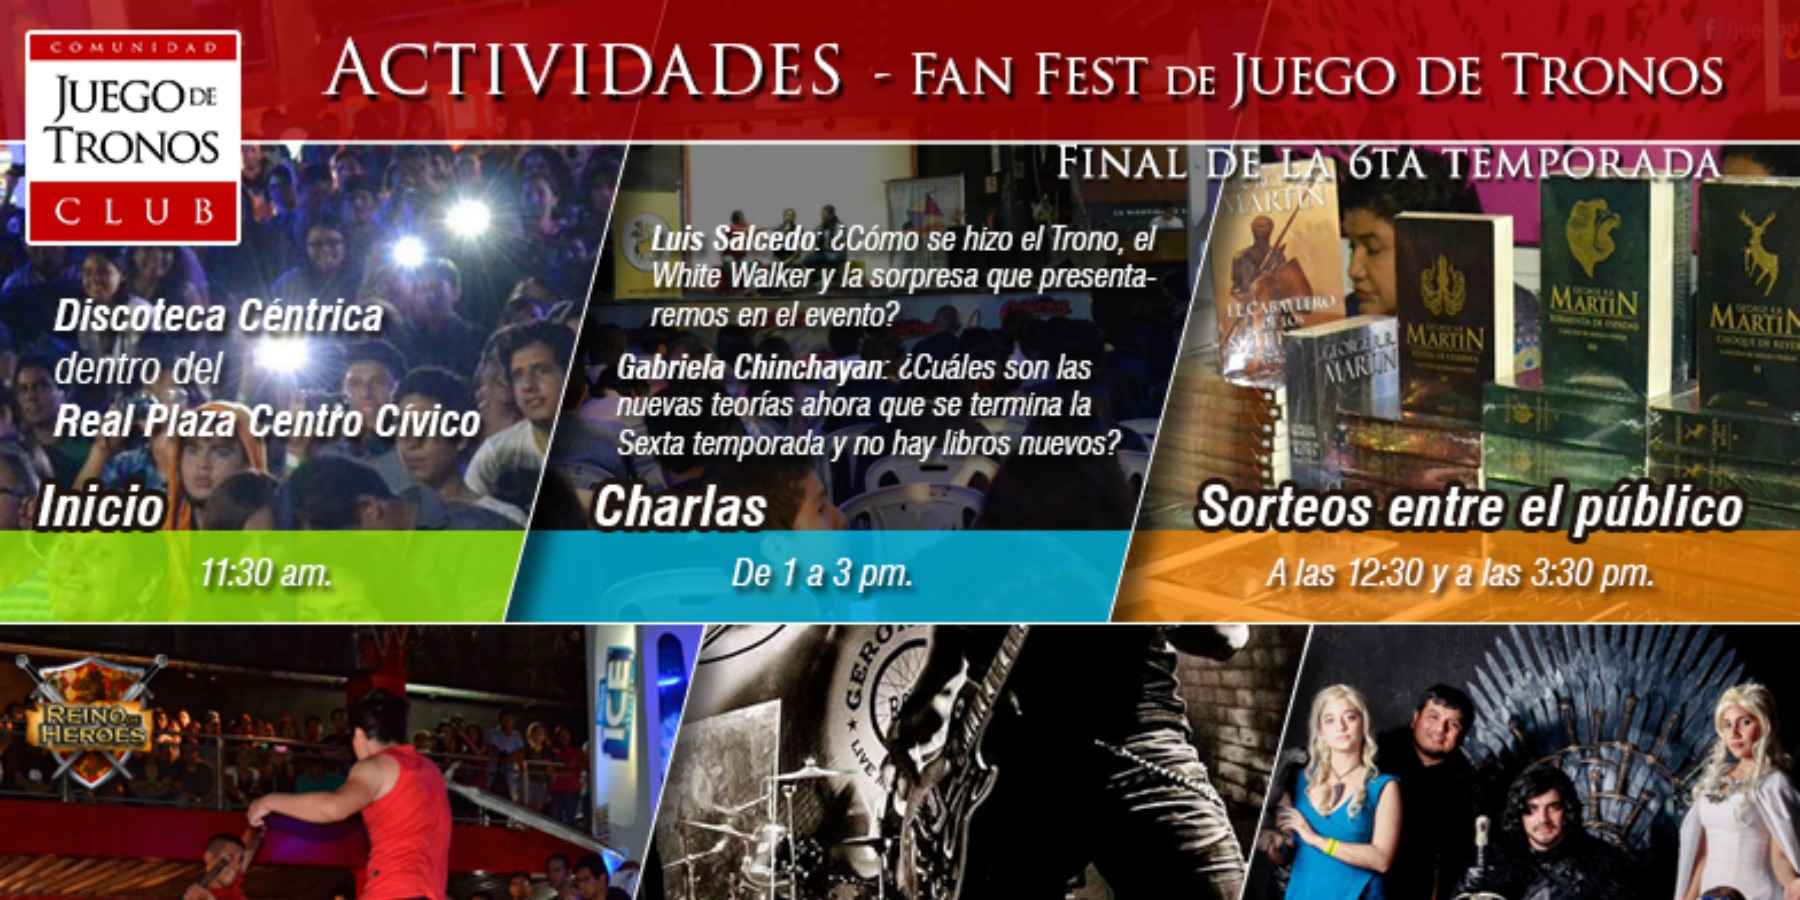 Fan Fest Juego de Tronos | Final de temporada